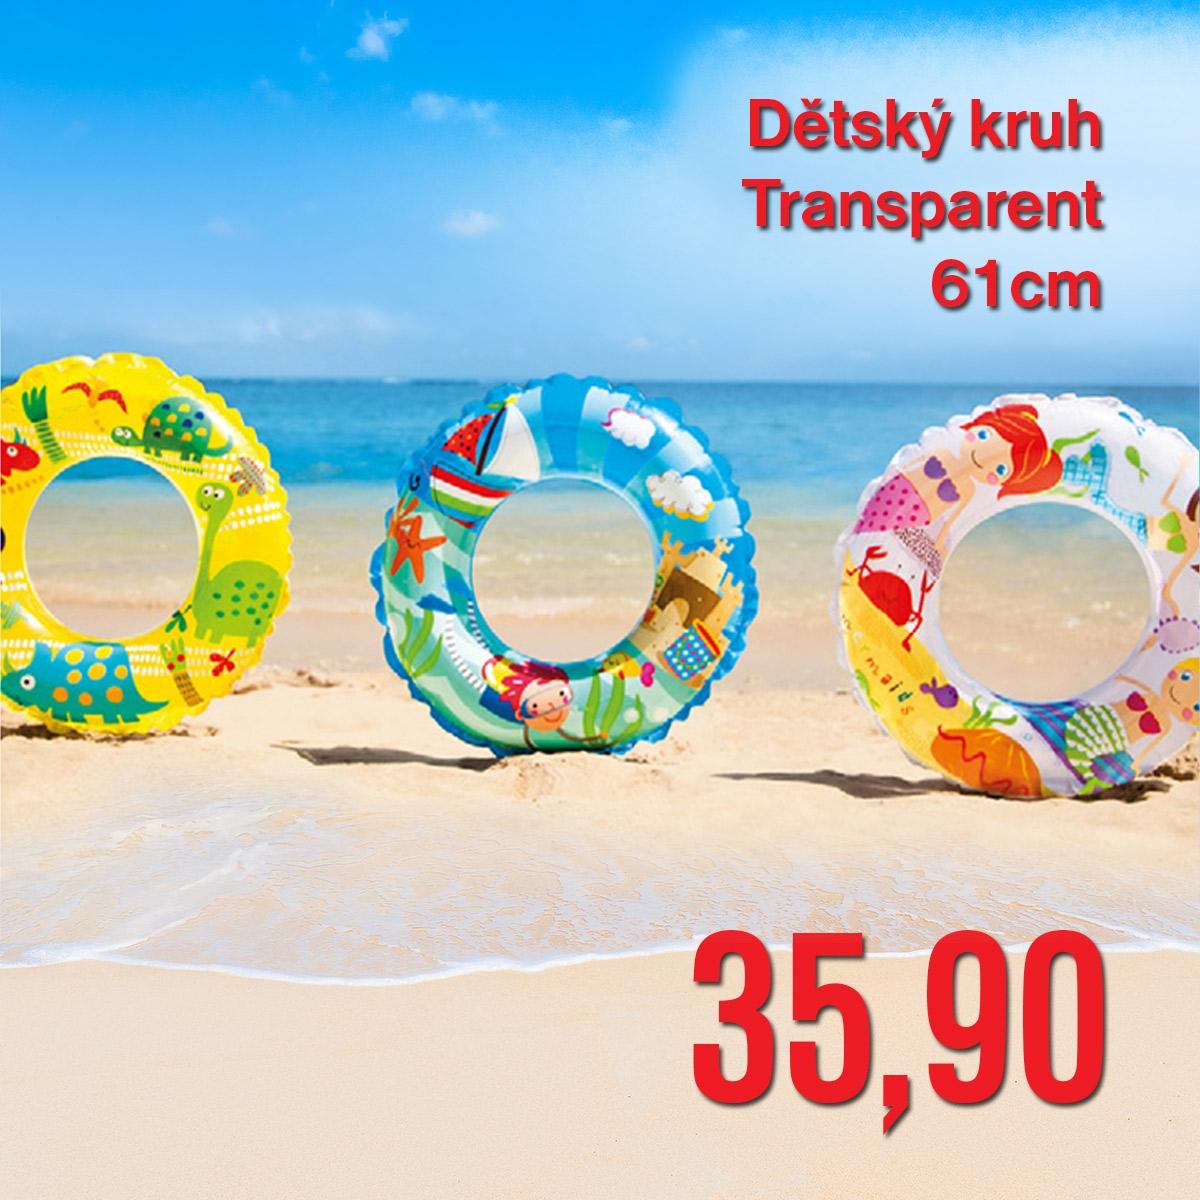 Dětský kruh Transparent 61 cm